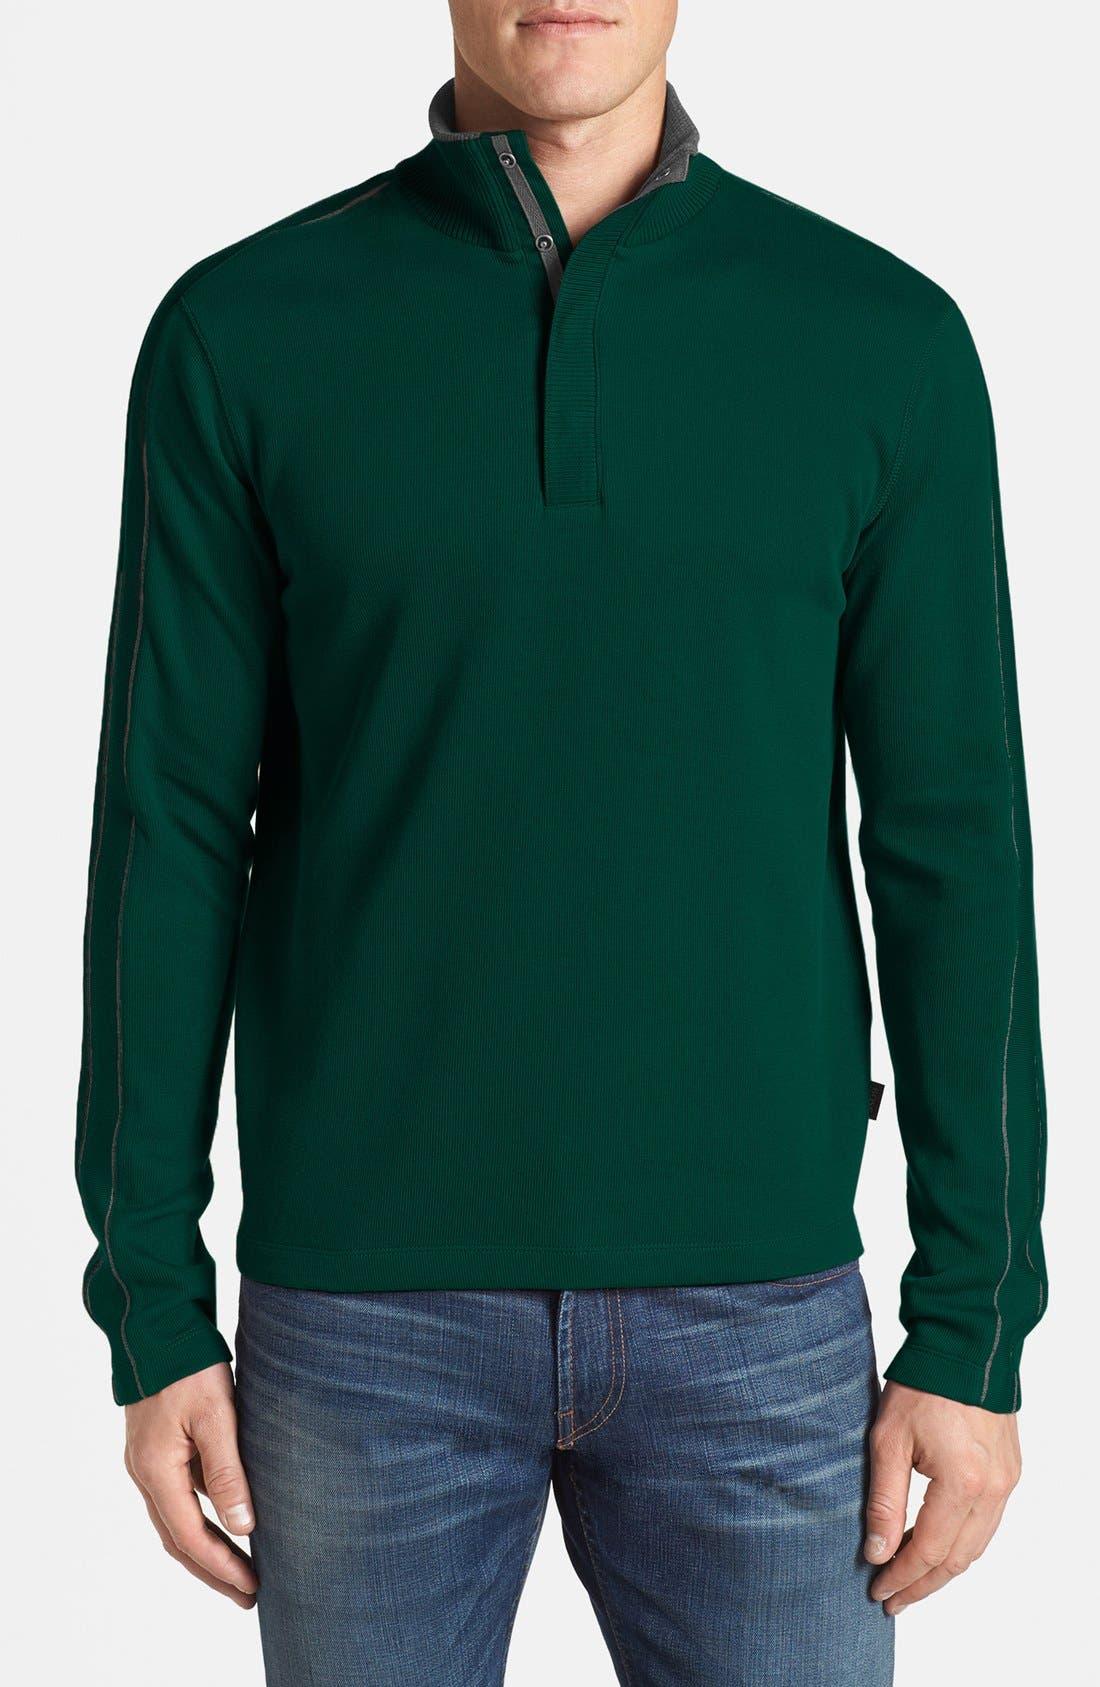 Alternate Image 1 Selected - BOSS HUGO BOSS 'Piceno' Regular Fit Long Sleeve Pullover